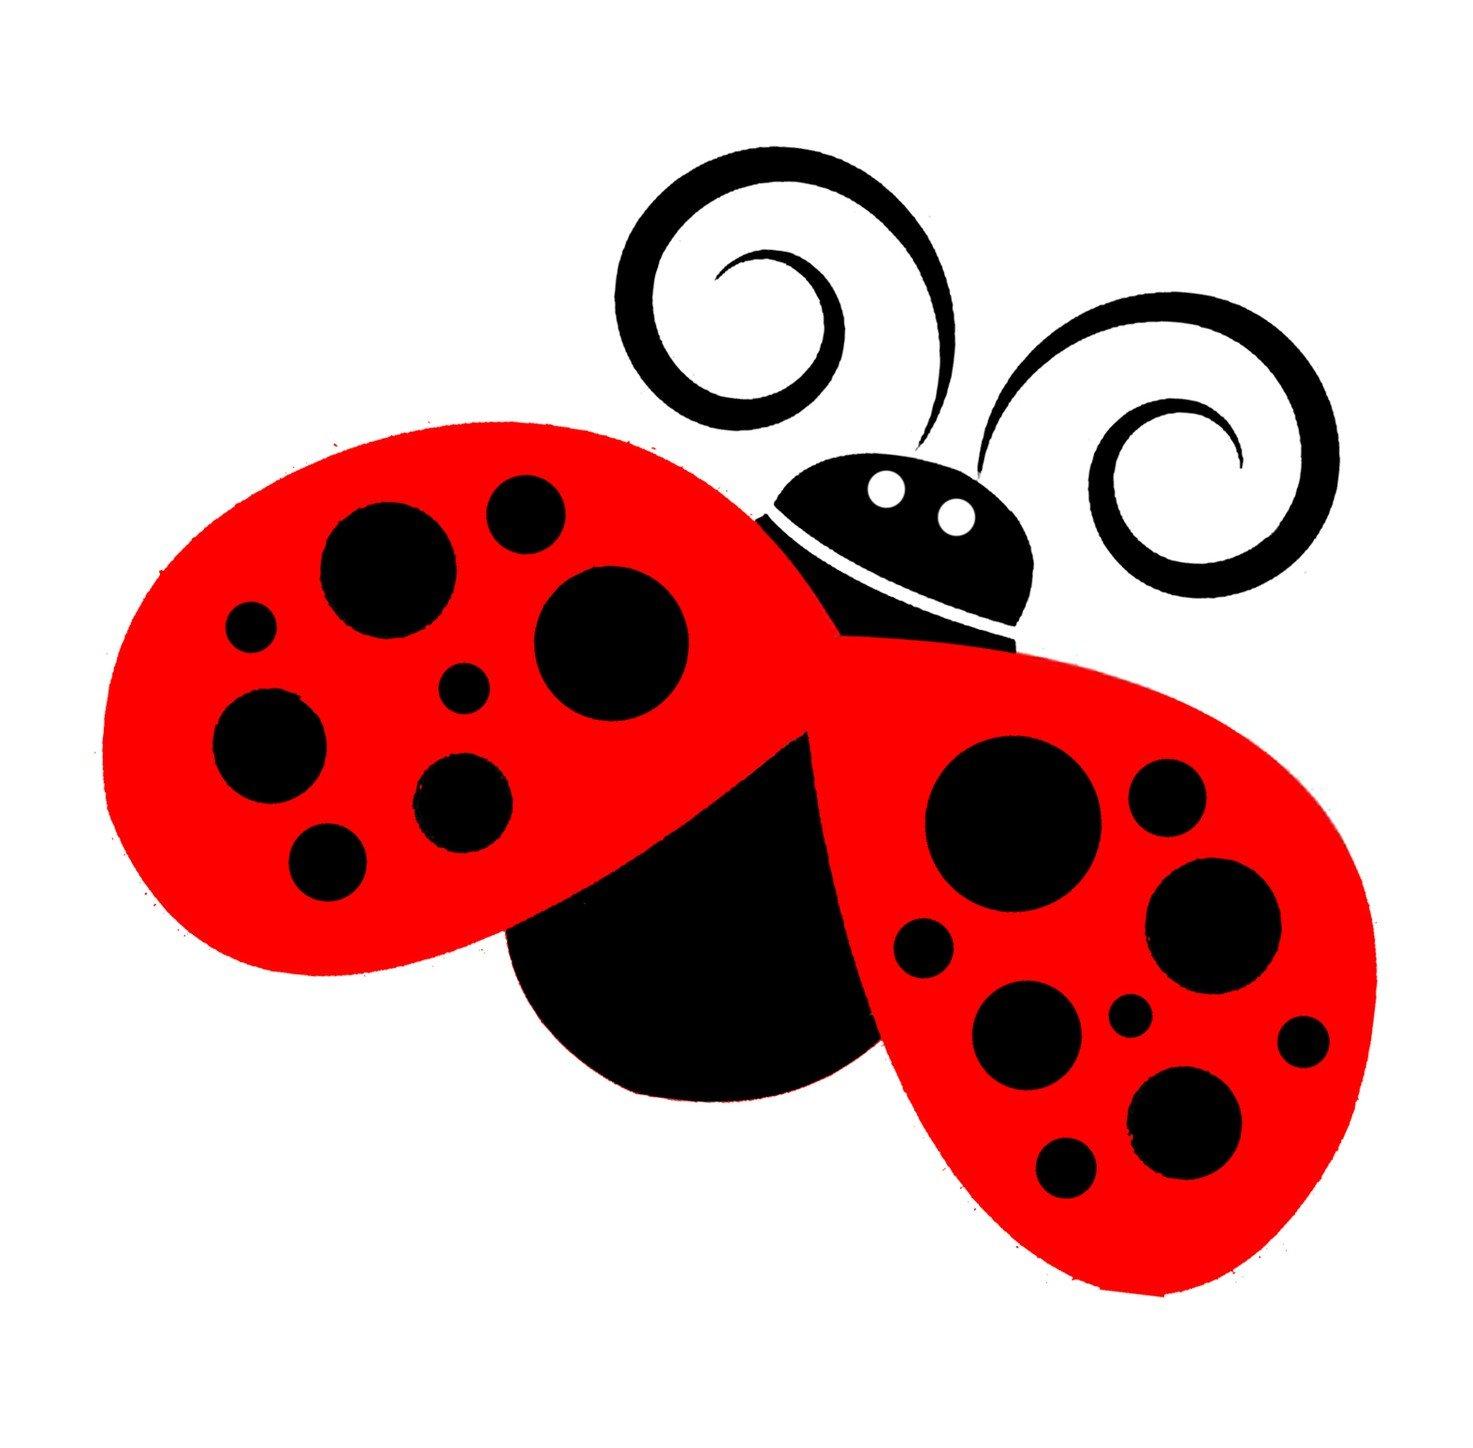 oficina da Ladybug's